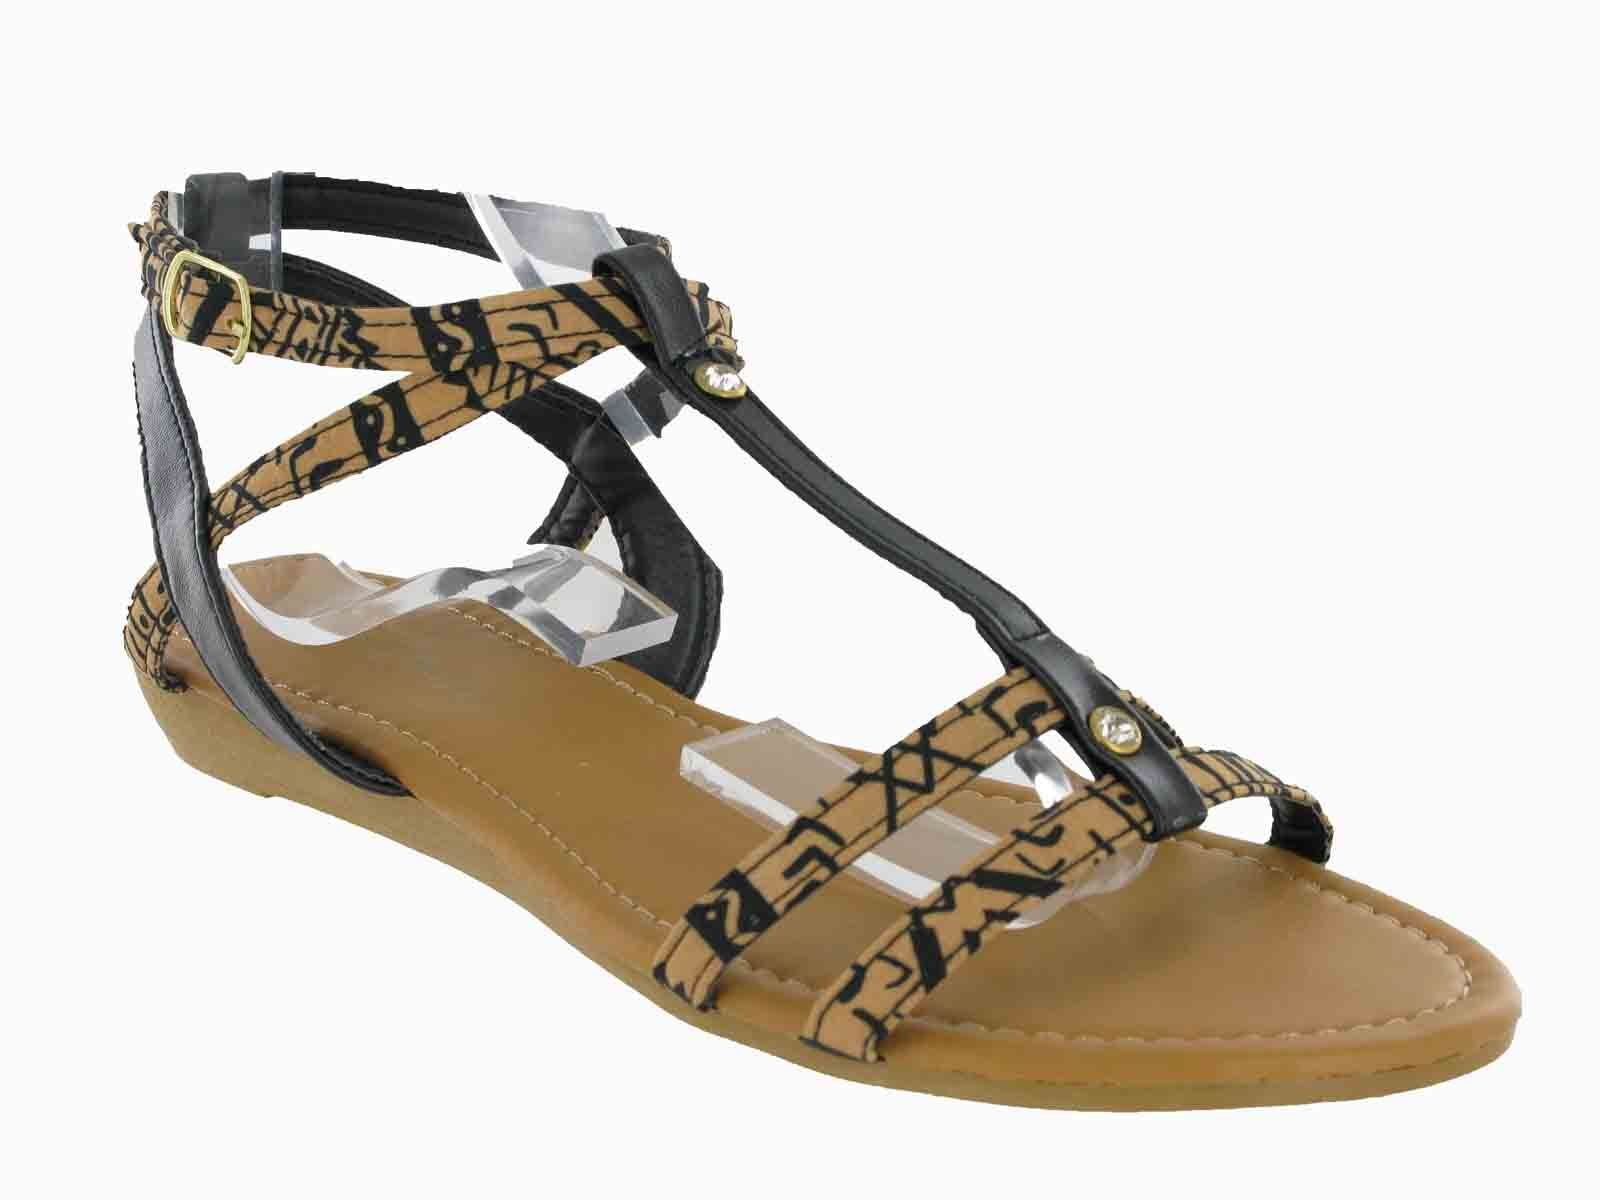 436fbc1b6ca Open Toe Flip Flop Buckle Small Wedge Summer Womens Studded Sandals UK3-9